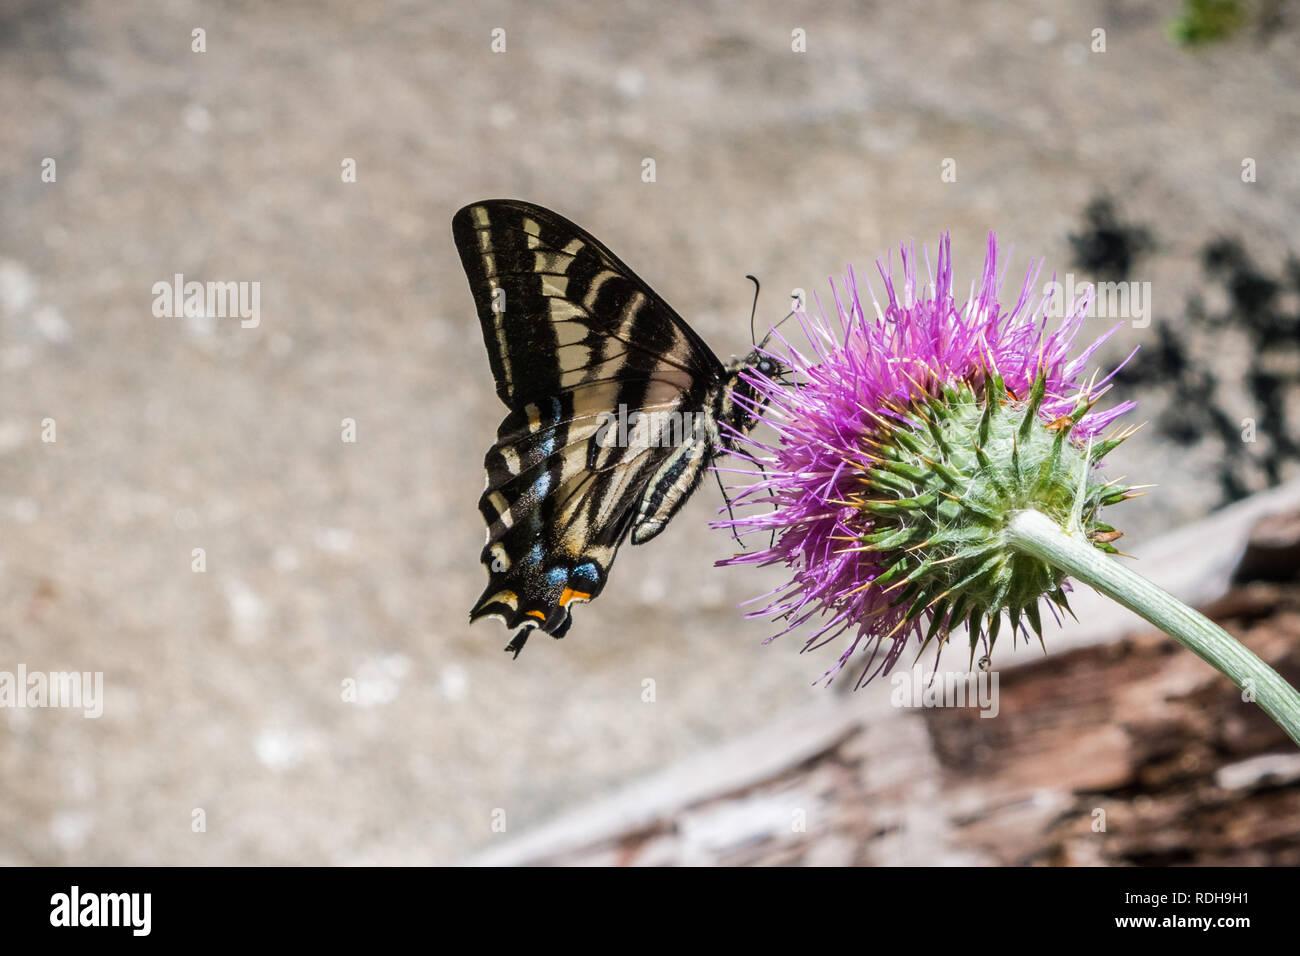 Western Tiger Swallowtail (Papilio rutulus) pollinating a thistle flower, Yosemite National Park, California Stock Photo